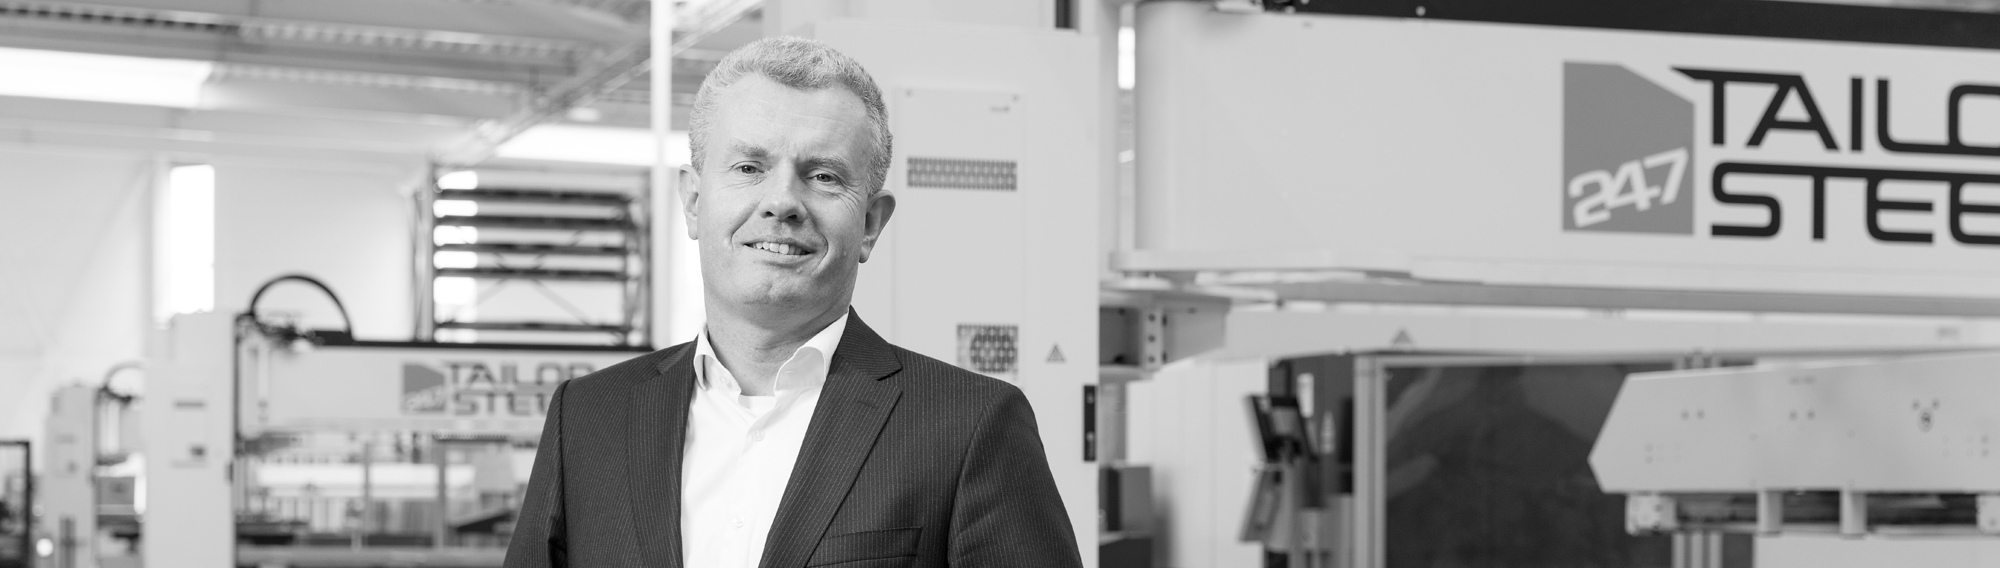 Paul Schipper- CEO 247 TailorSteel-br